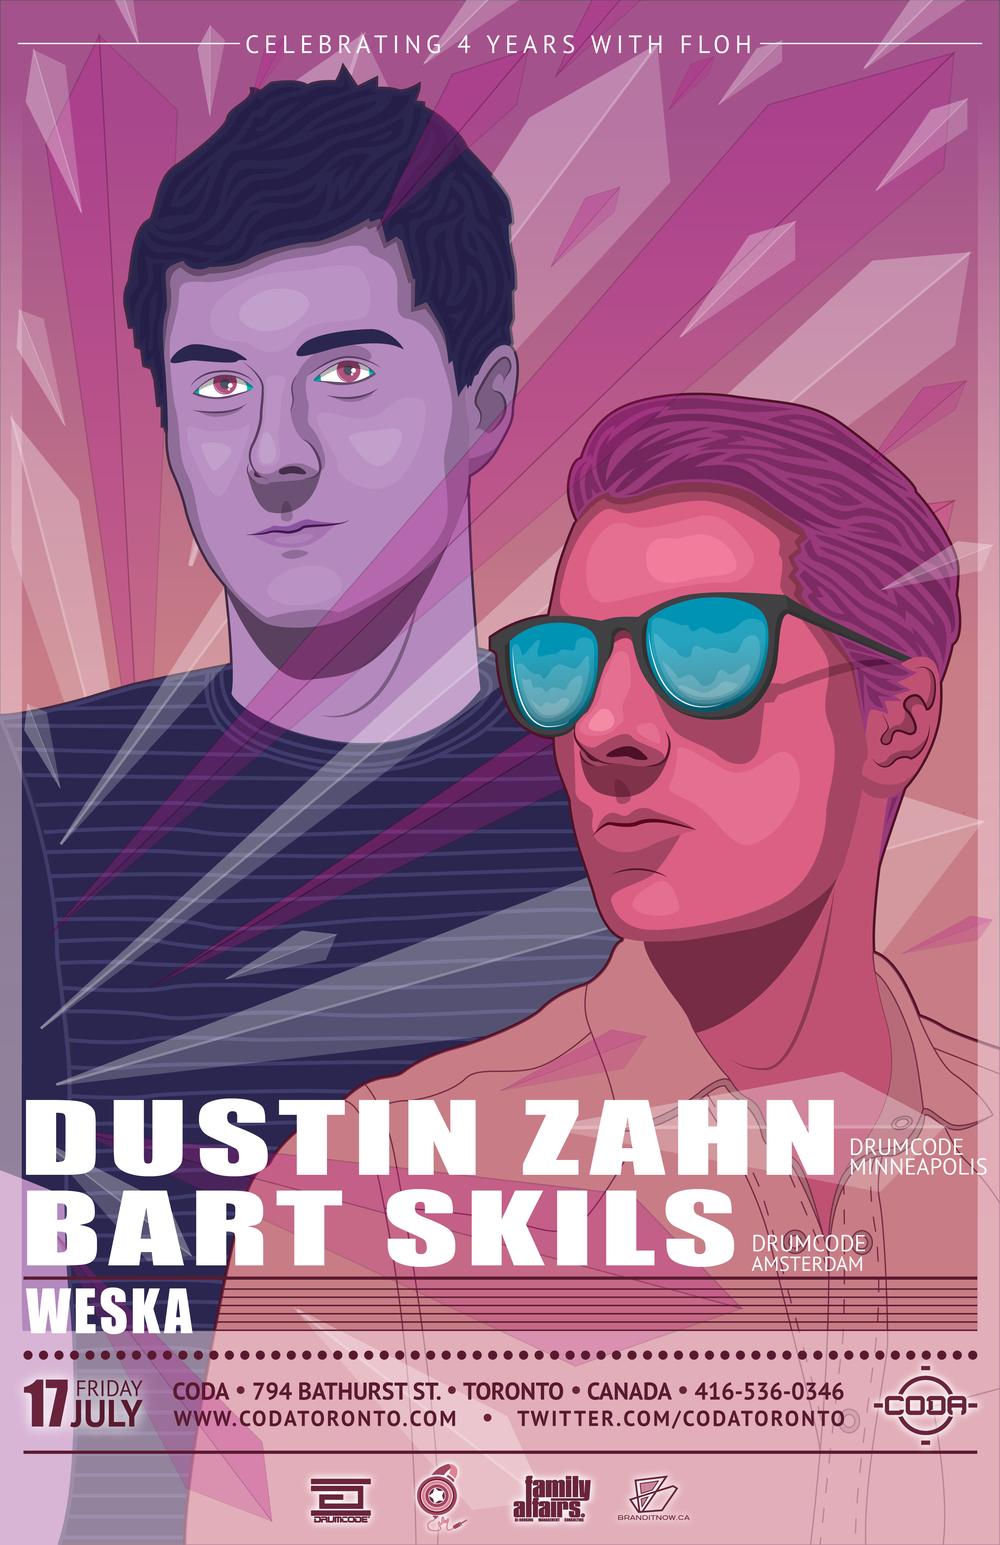 Dustin Zahn Bart Skils & Weska 11 x 17 Poster 15 FINAL-01.png